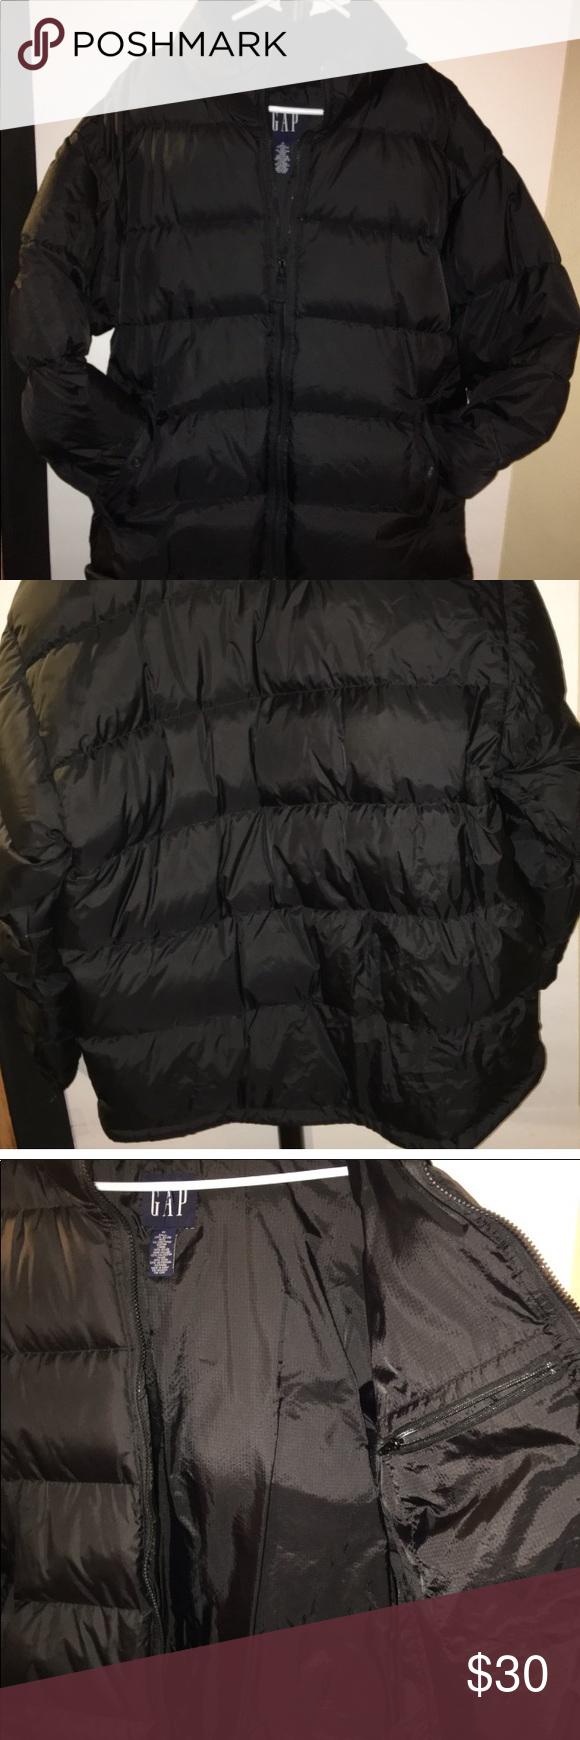 Men S Gap Puffer Coat Puffer Coat Black Puffer Coat Fashion [ 1740 x 580 Pixel ]